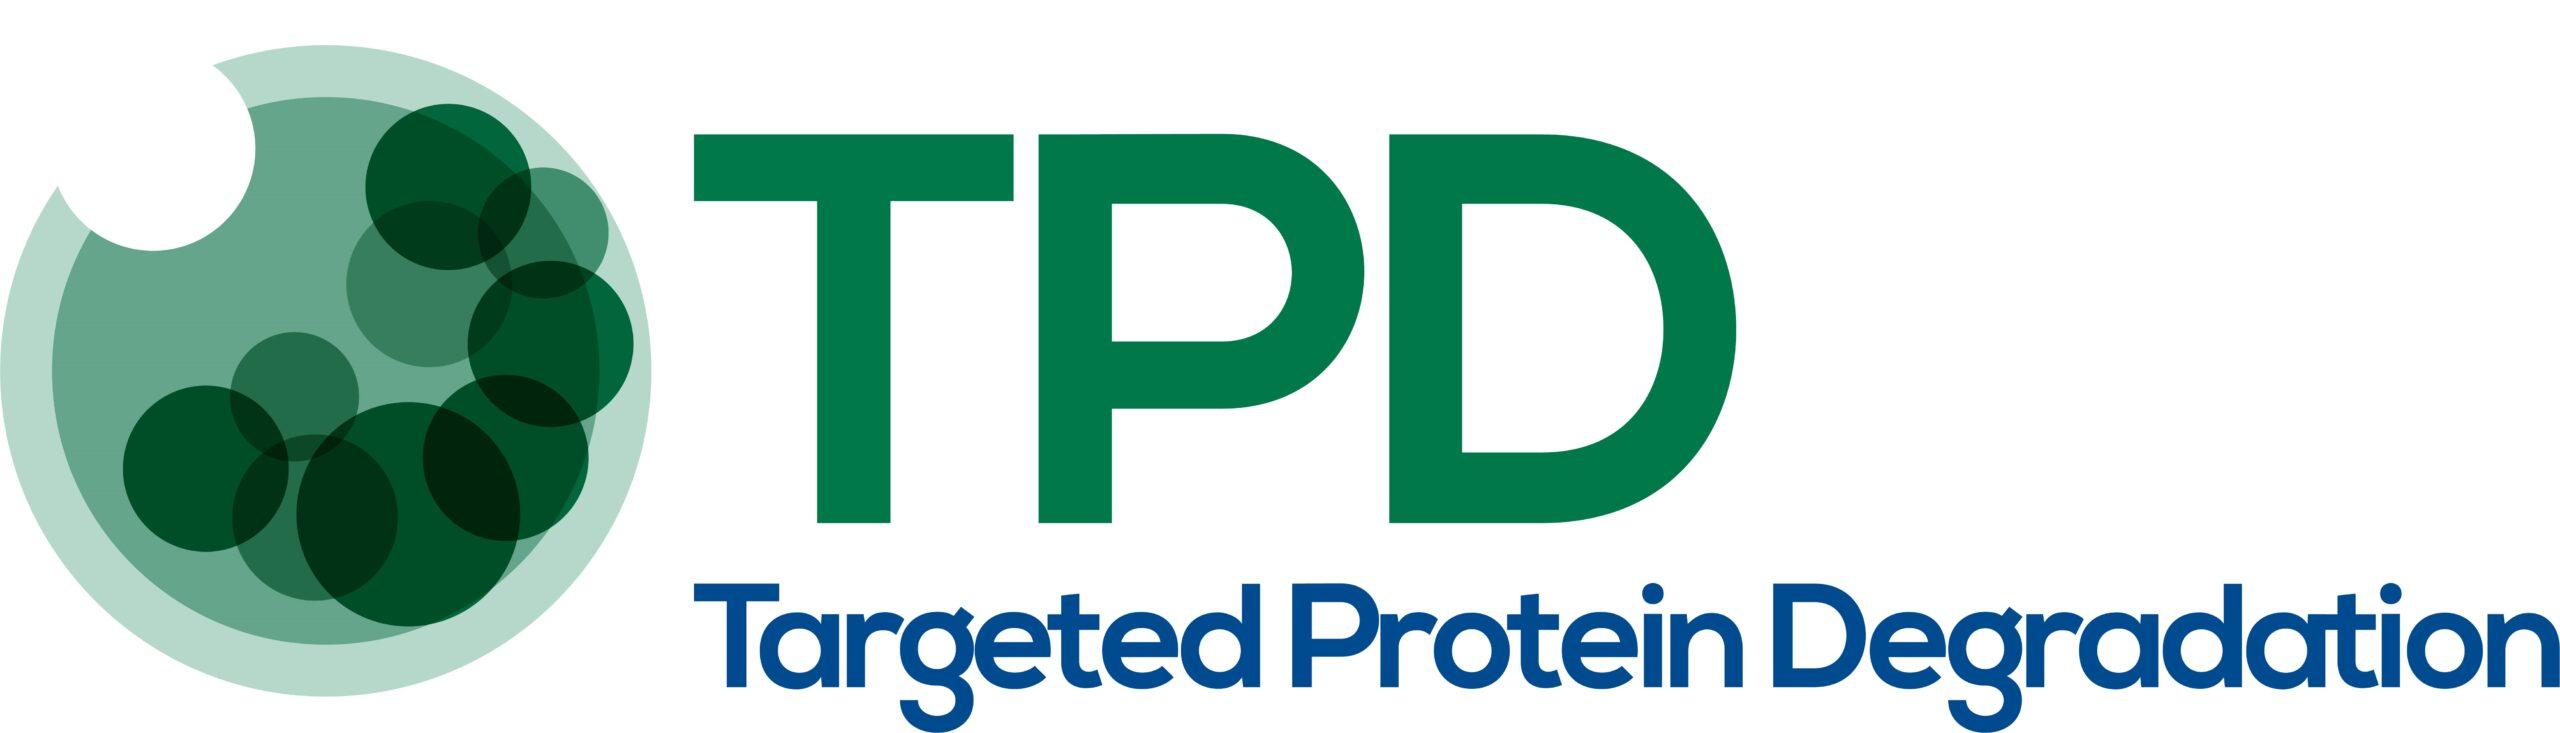 HW200504 TPD 2020 logo NO DATE